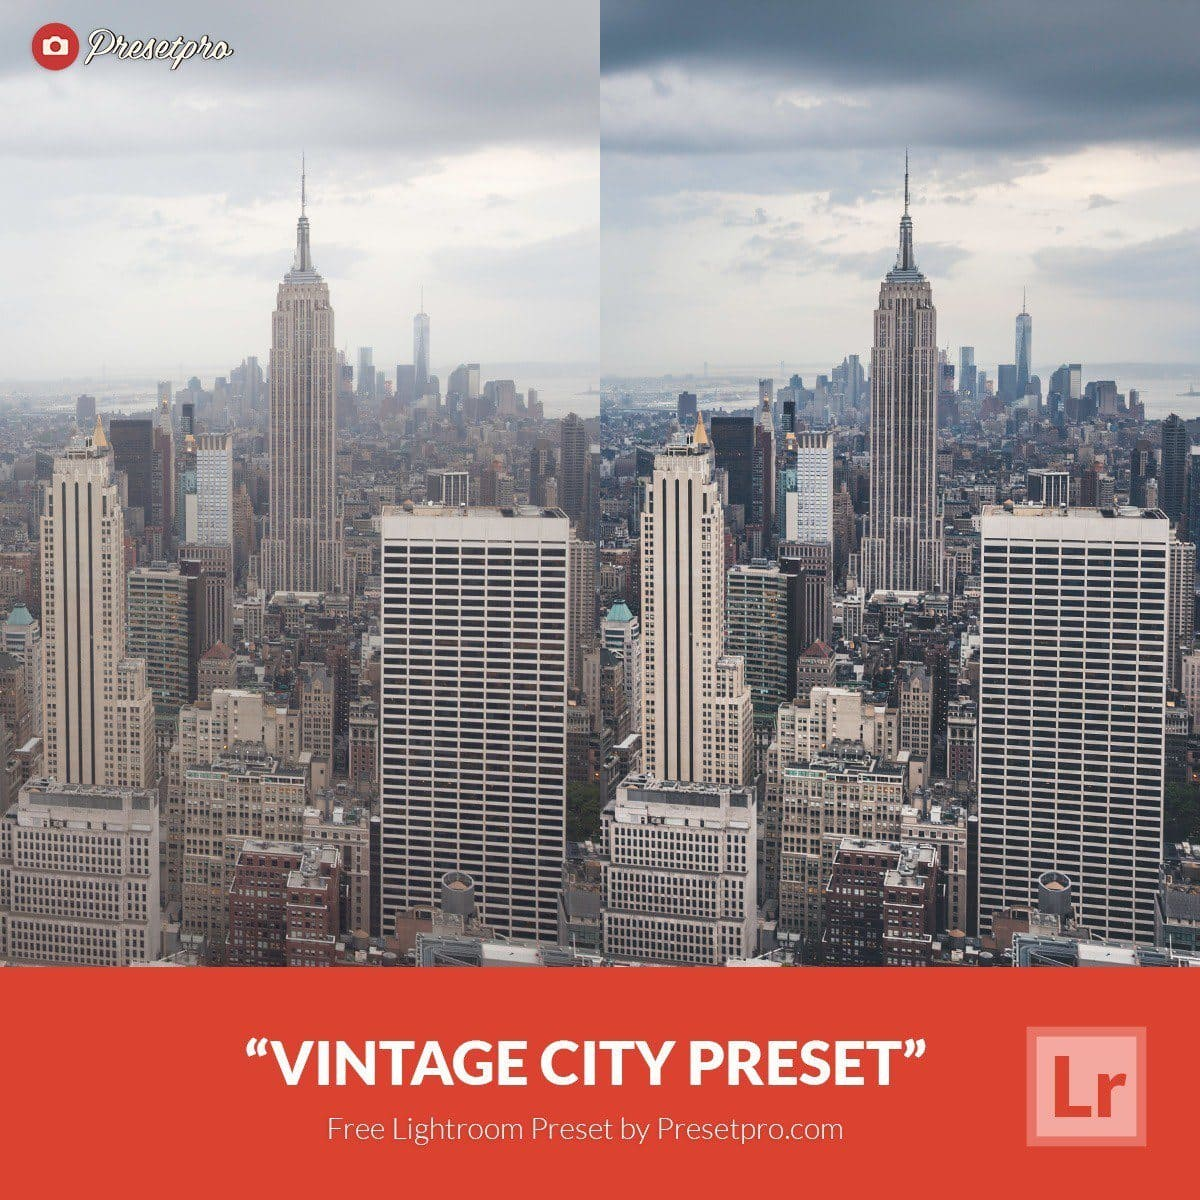 Free-Lightroom-Preset-Vintage-City